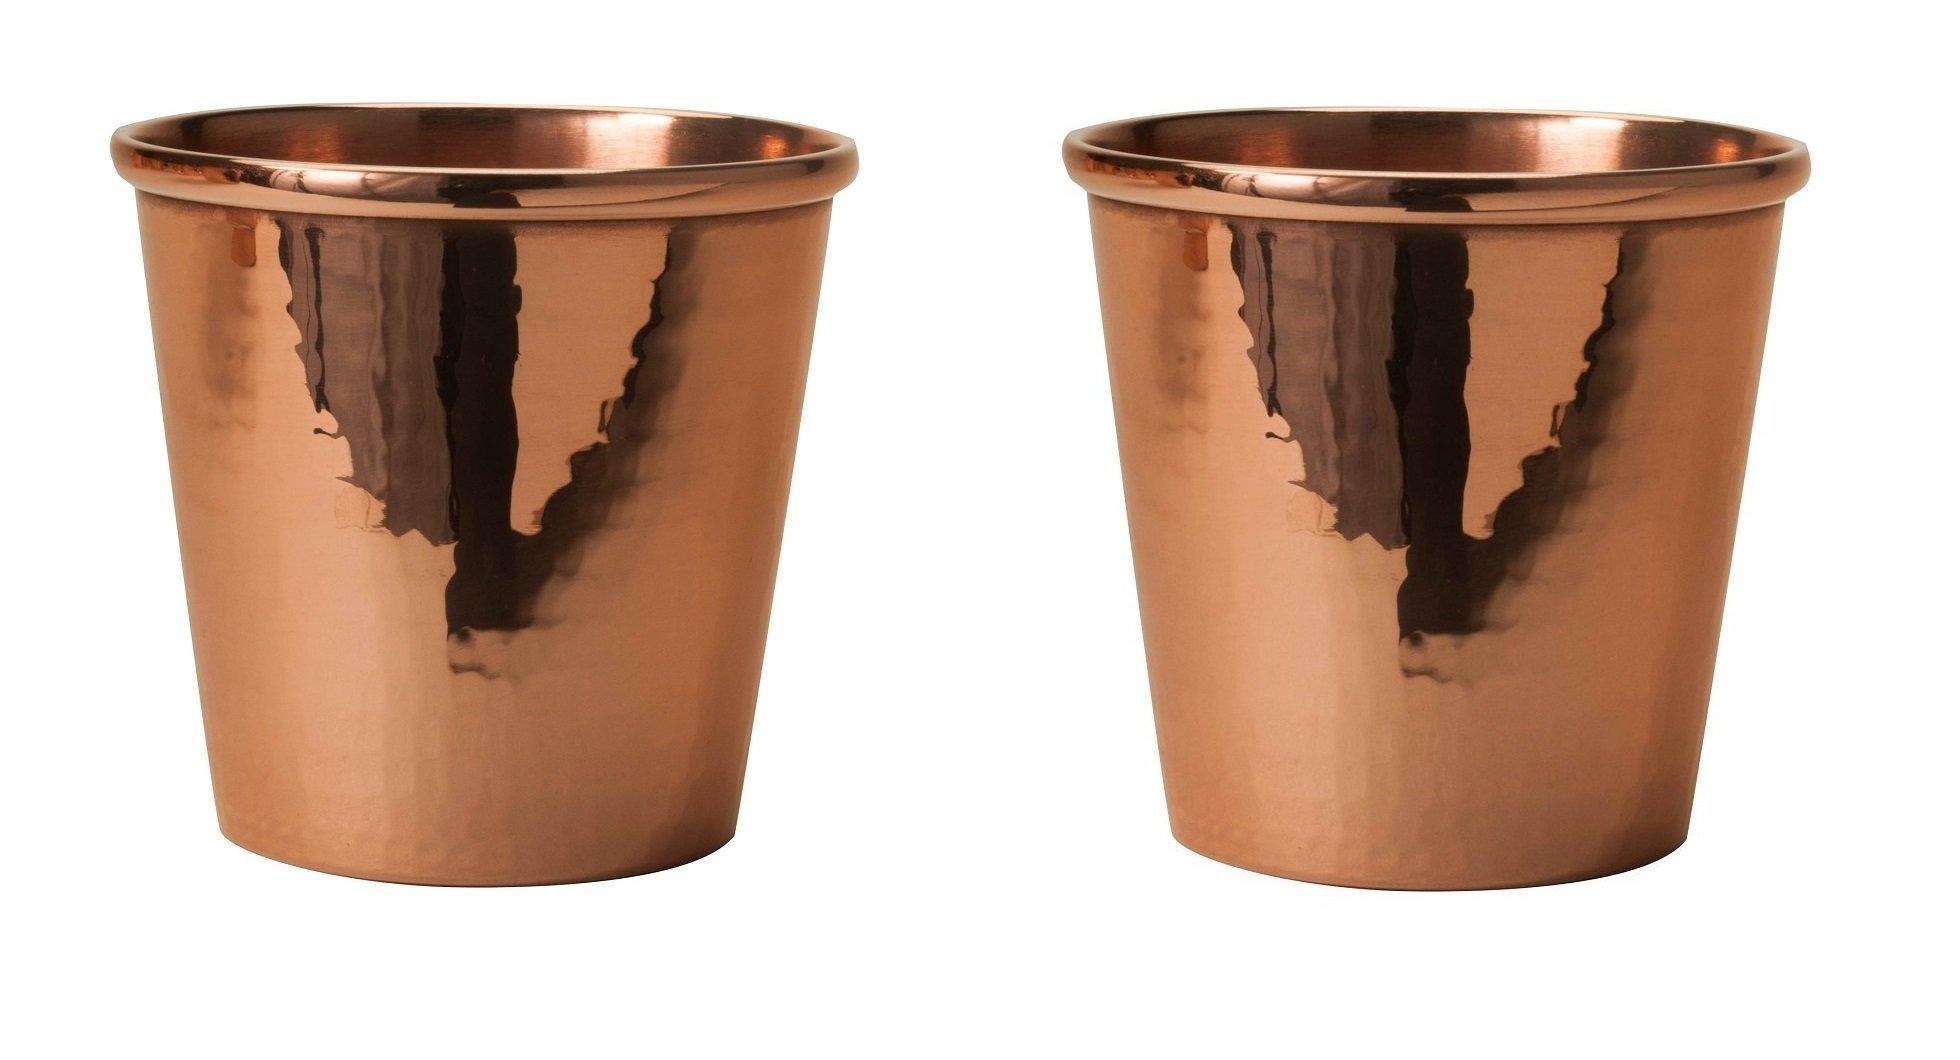 Sertodo Copper CC-18-2 Apa Cup, Hand Hammered 100% Pure Copper, 18 oz, Set of 2